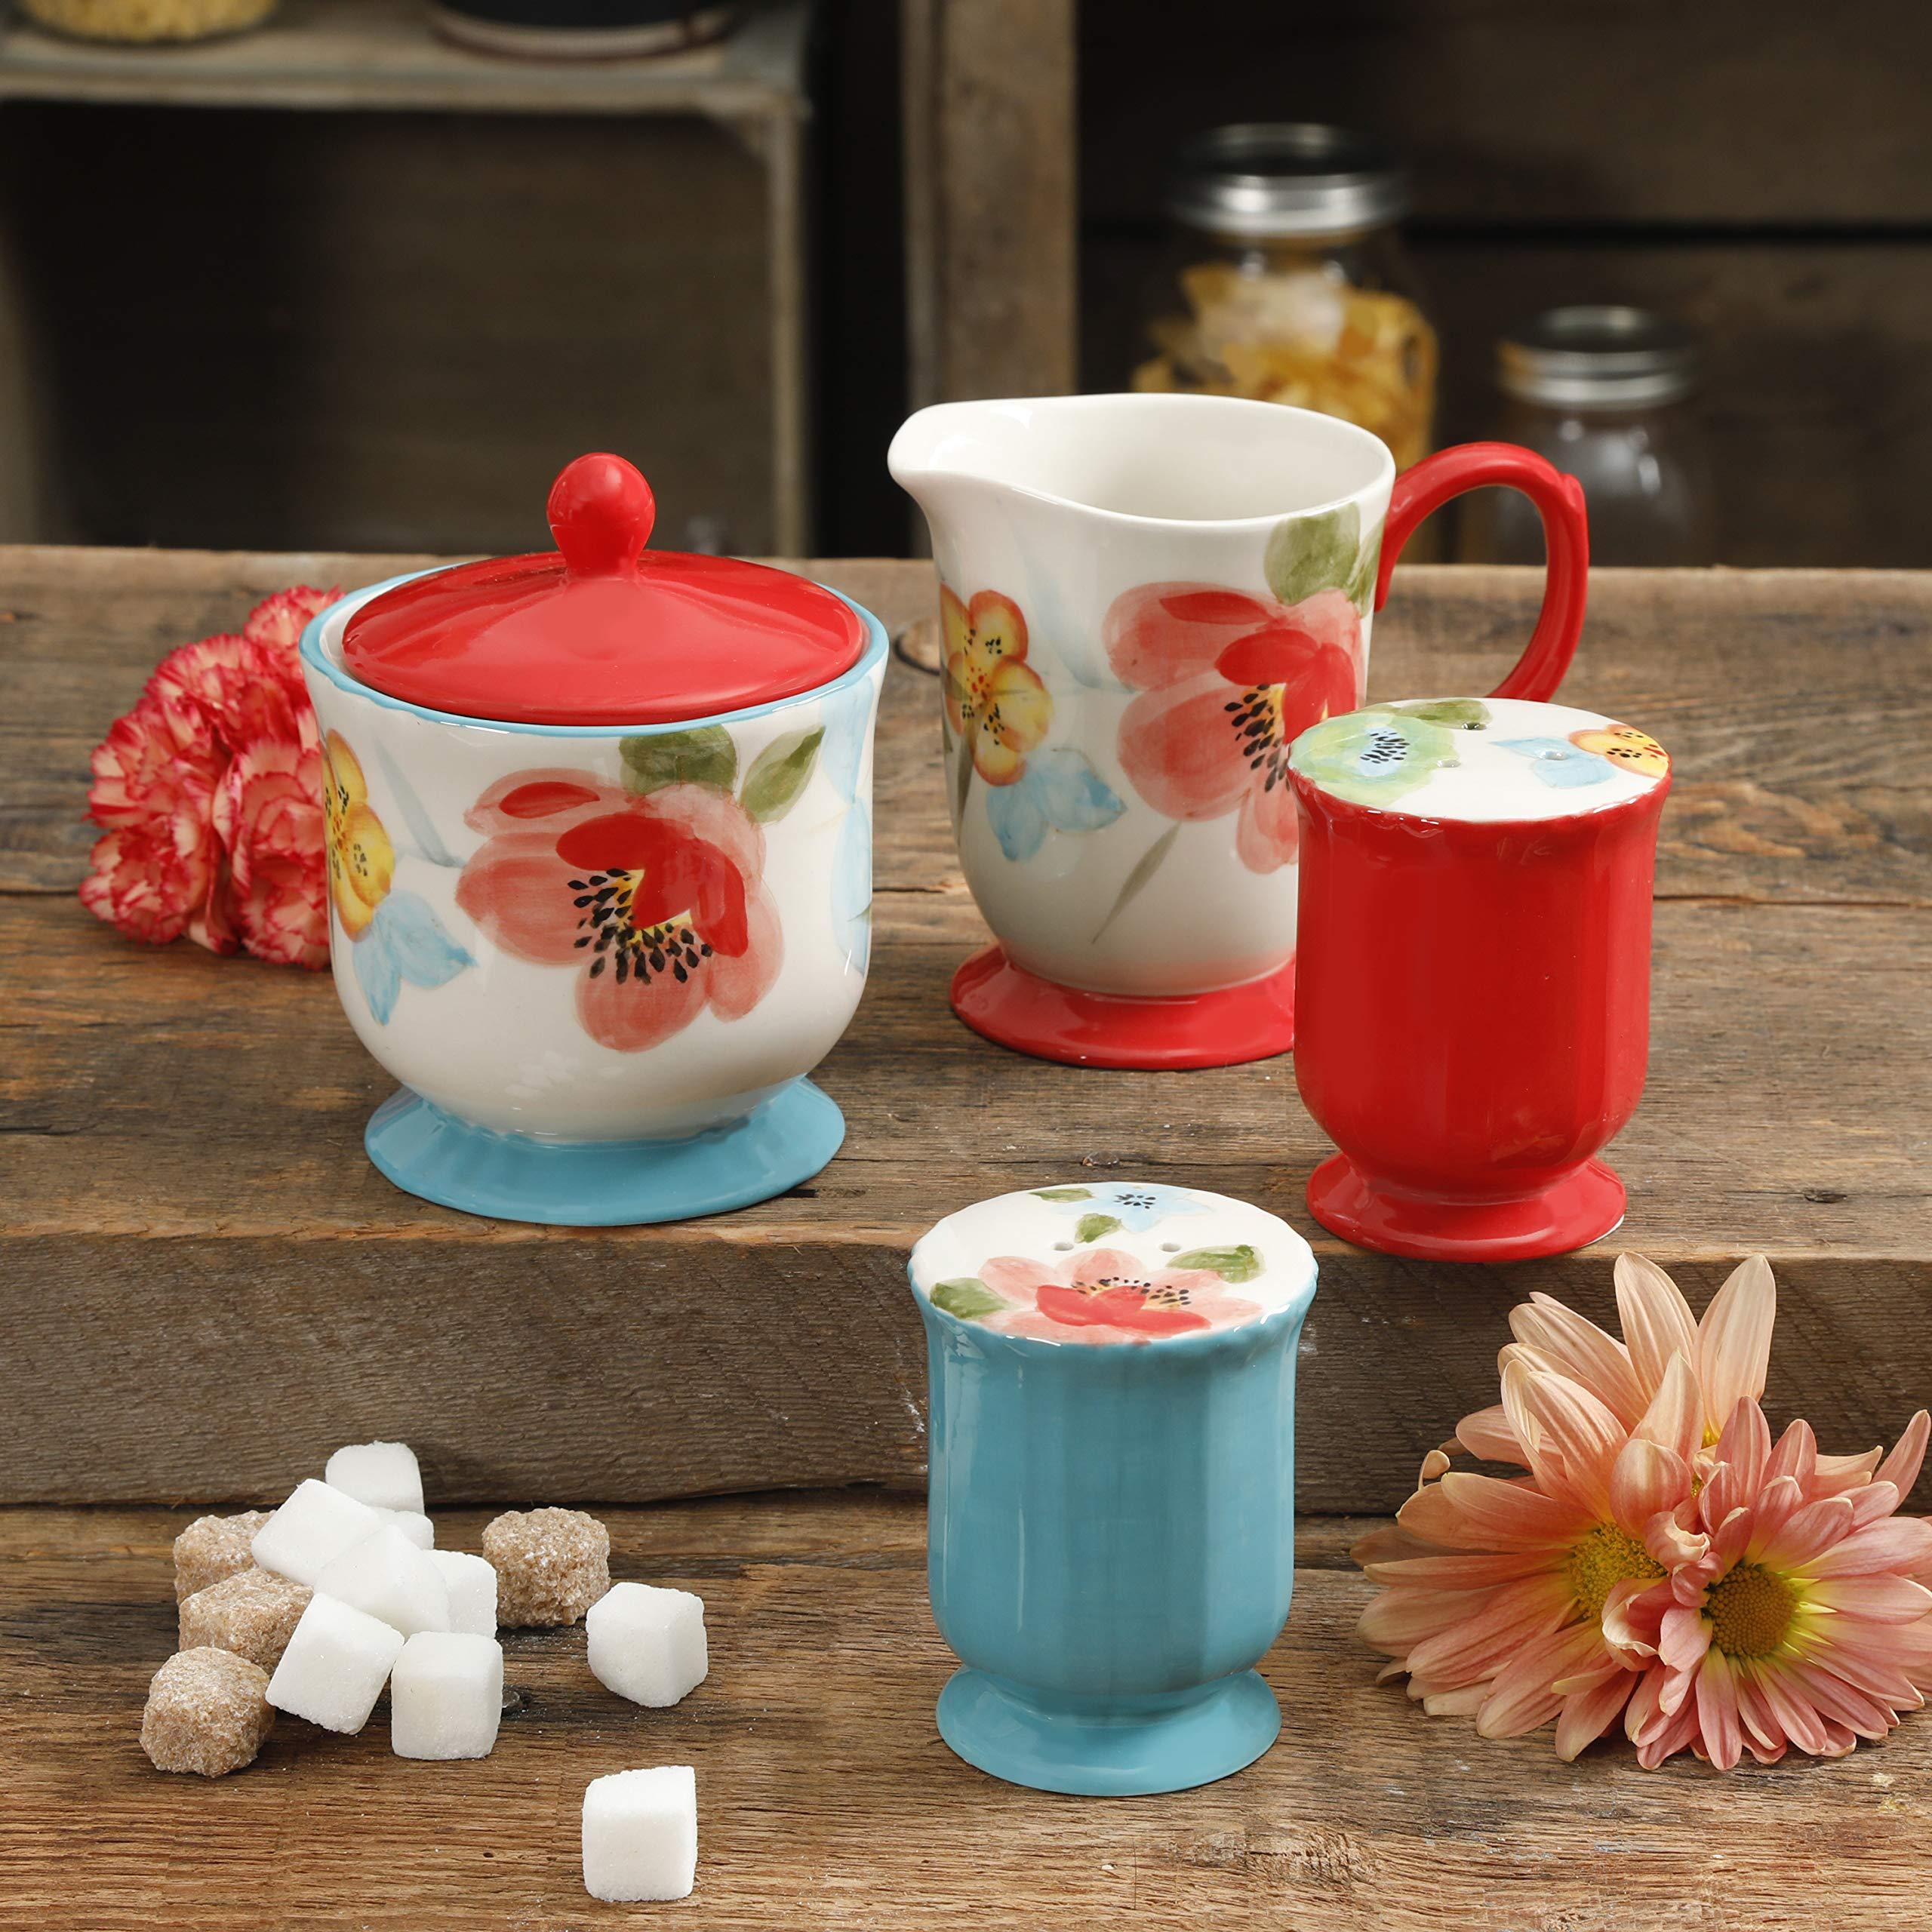 The Pioneer Woman Vintage Floral Bloom 5-Piece Sugar and Creamer, Salt & Pepper Set